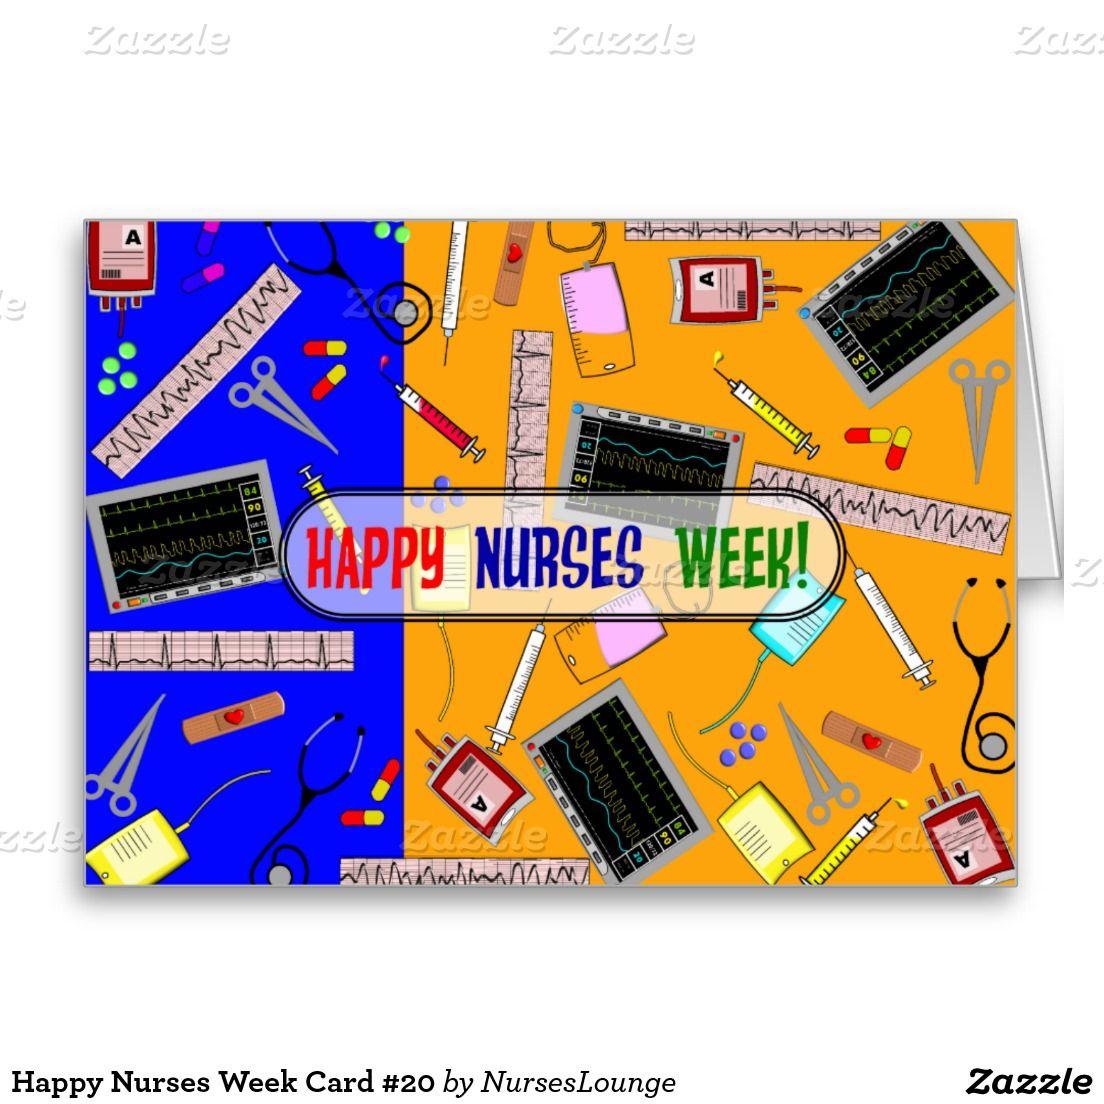 Happy nurses week card 20 greeting card icu nurse pinterest happy nurses week card 20 m4hsunfo Image collections